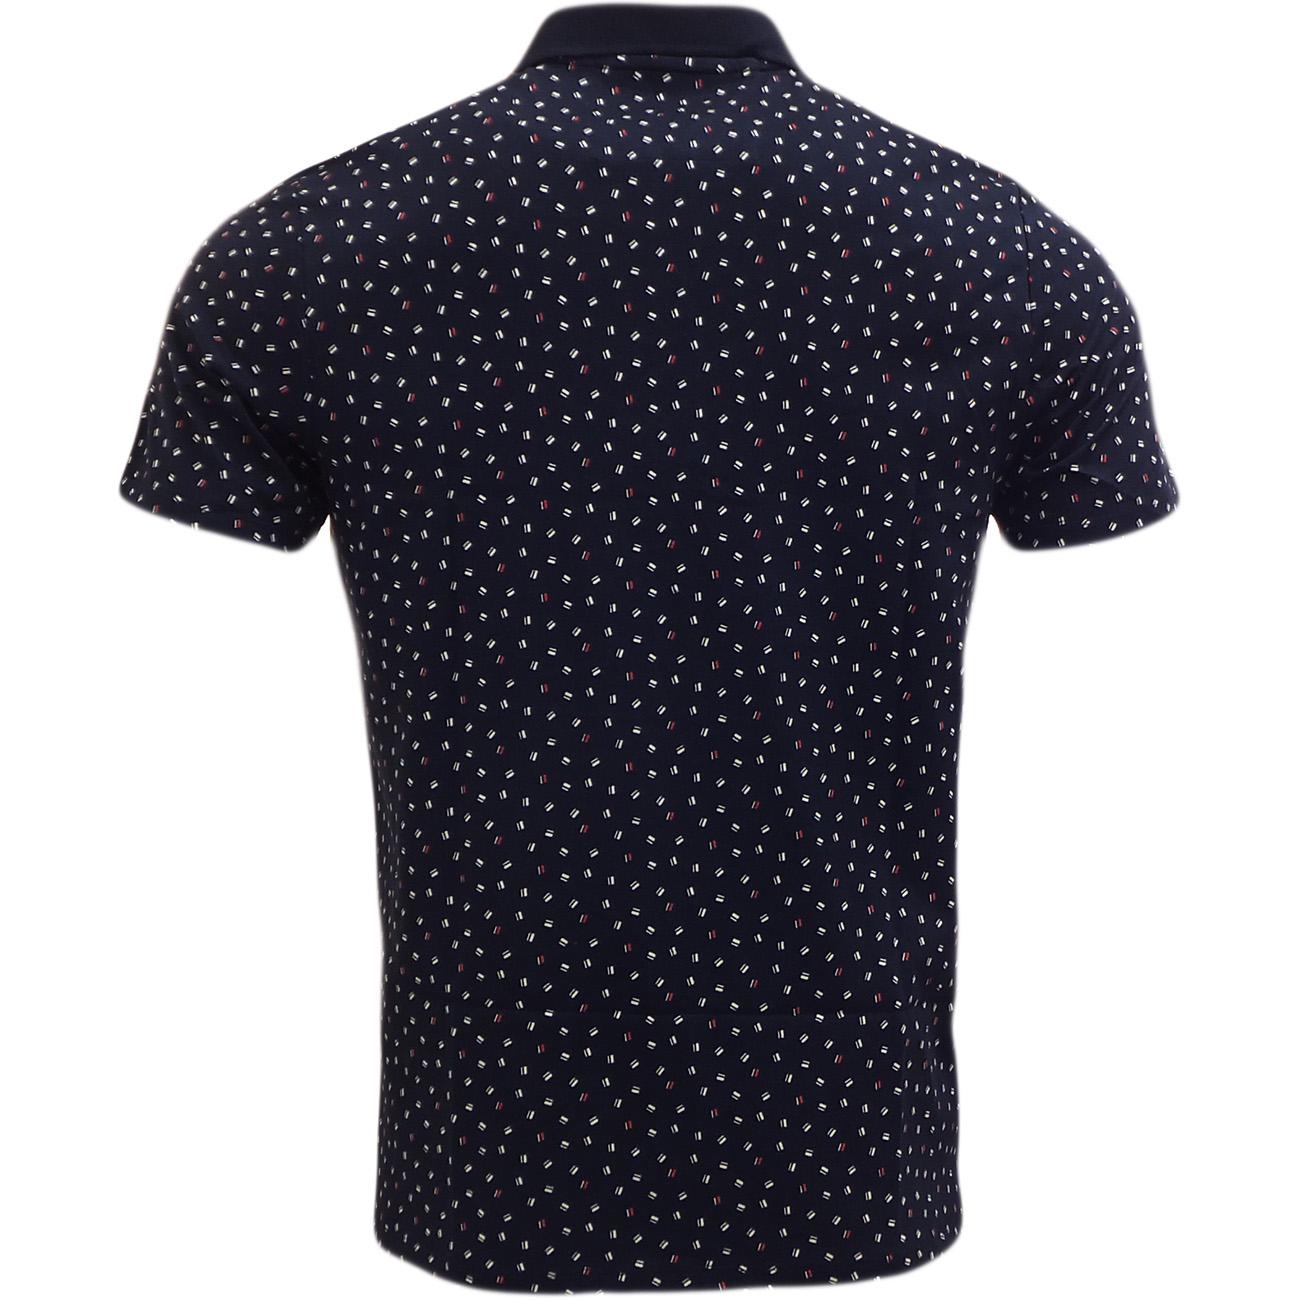 ben sherman polo shirt mens polos short sleeve shirts designer top ebay. Black Bedroom Furniture Sets. Home Design Ideas